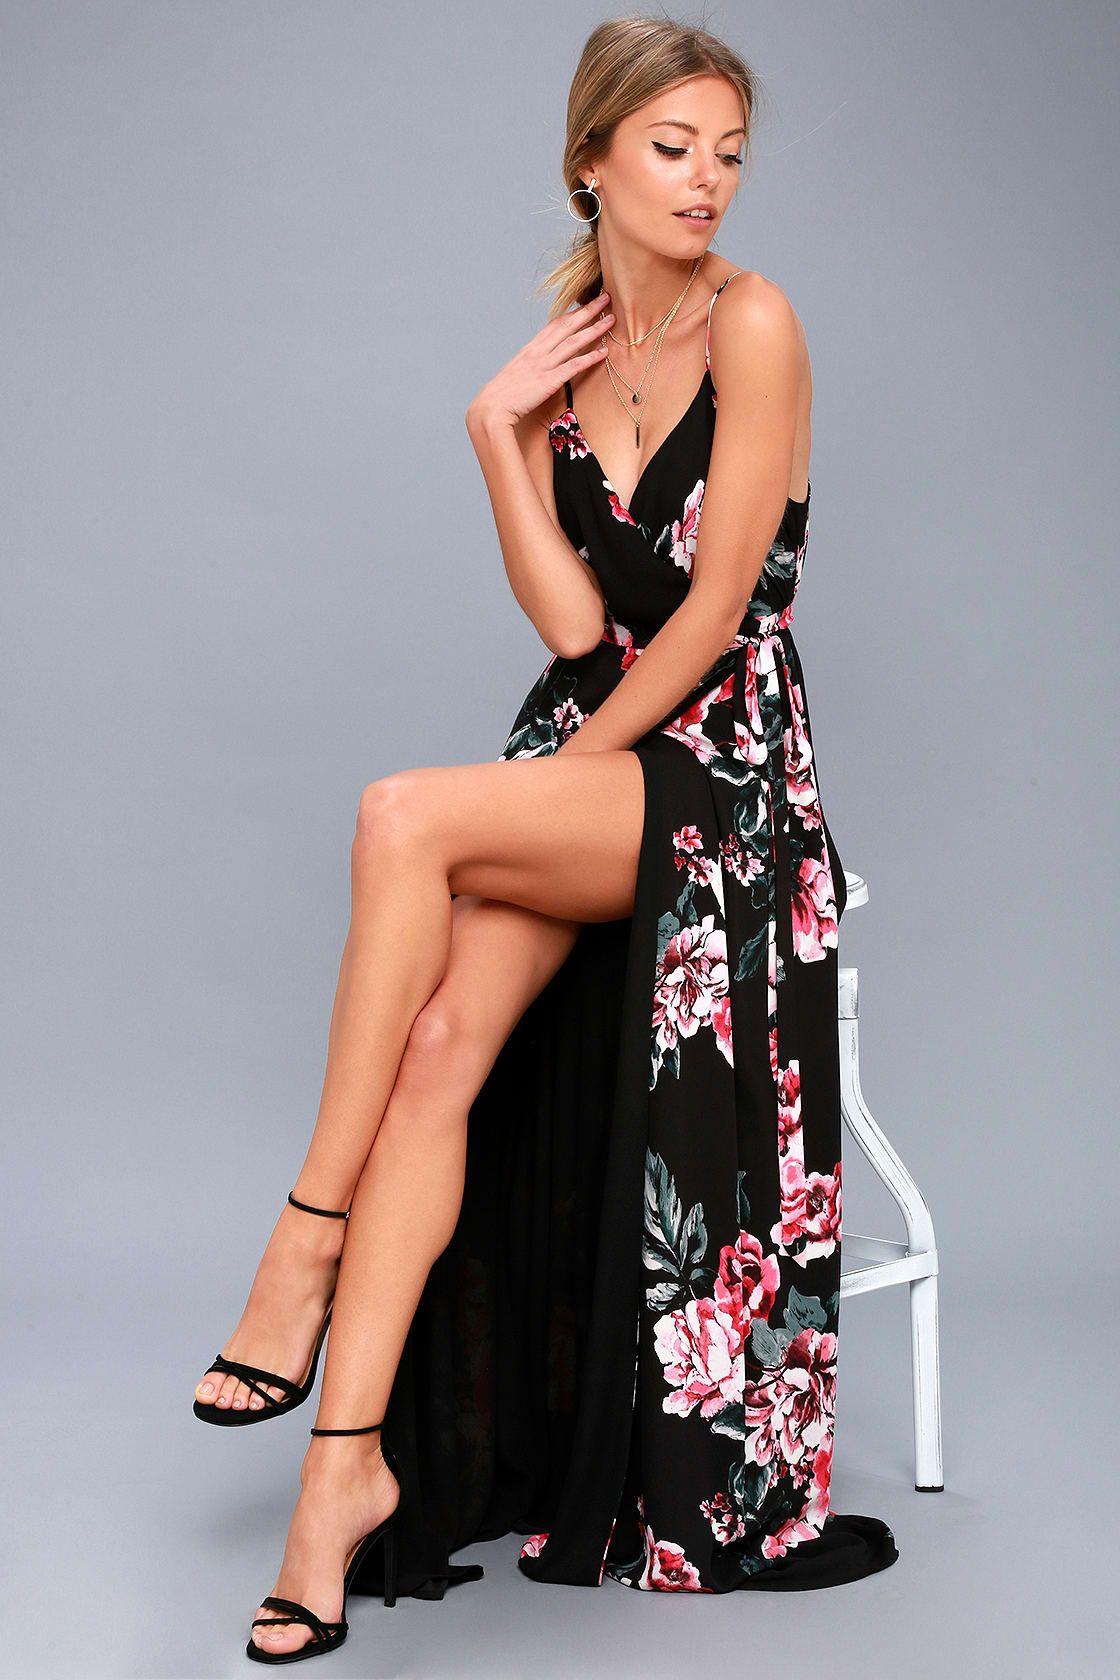 Floral Flirtation Black Floral Print Wrap Maxi Dress Maxi Dress Floral Print Maxi Dress Black Floral Print Dress [ 1680 x 1120 Pixel ]